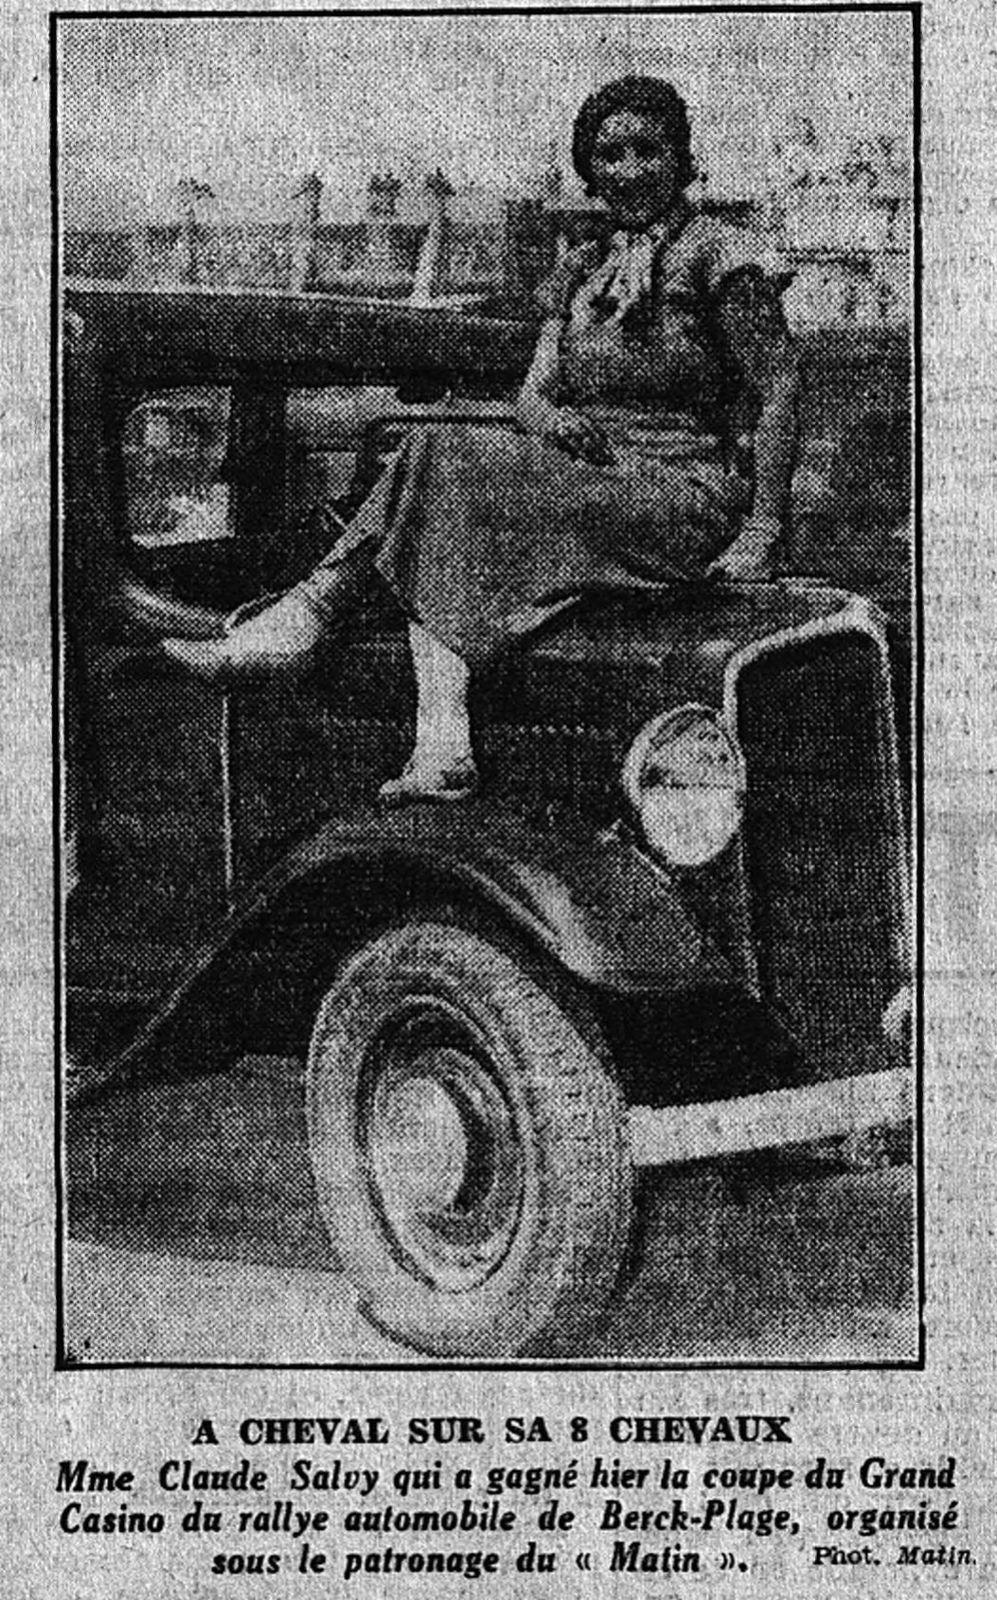 Le matin du 24/7/1933 (collection BNF Gallica)